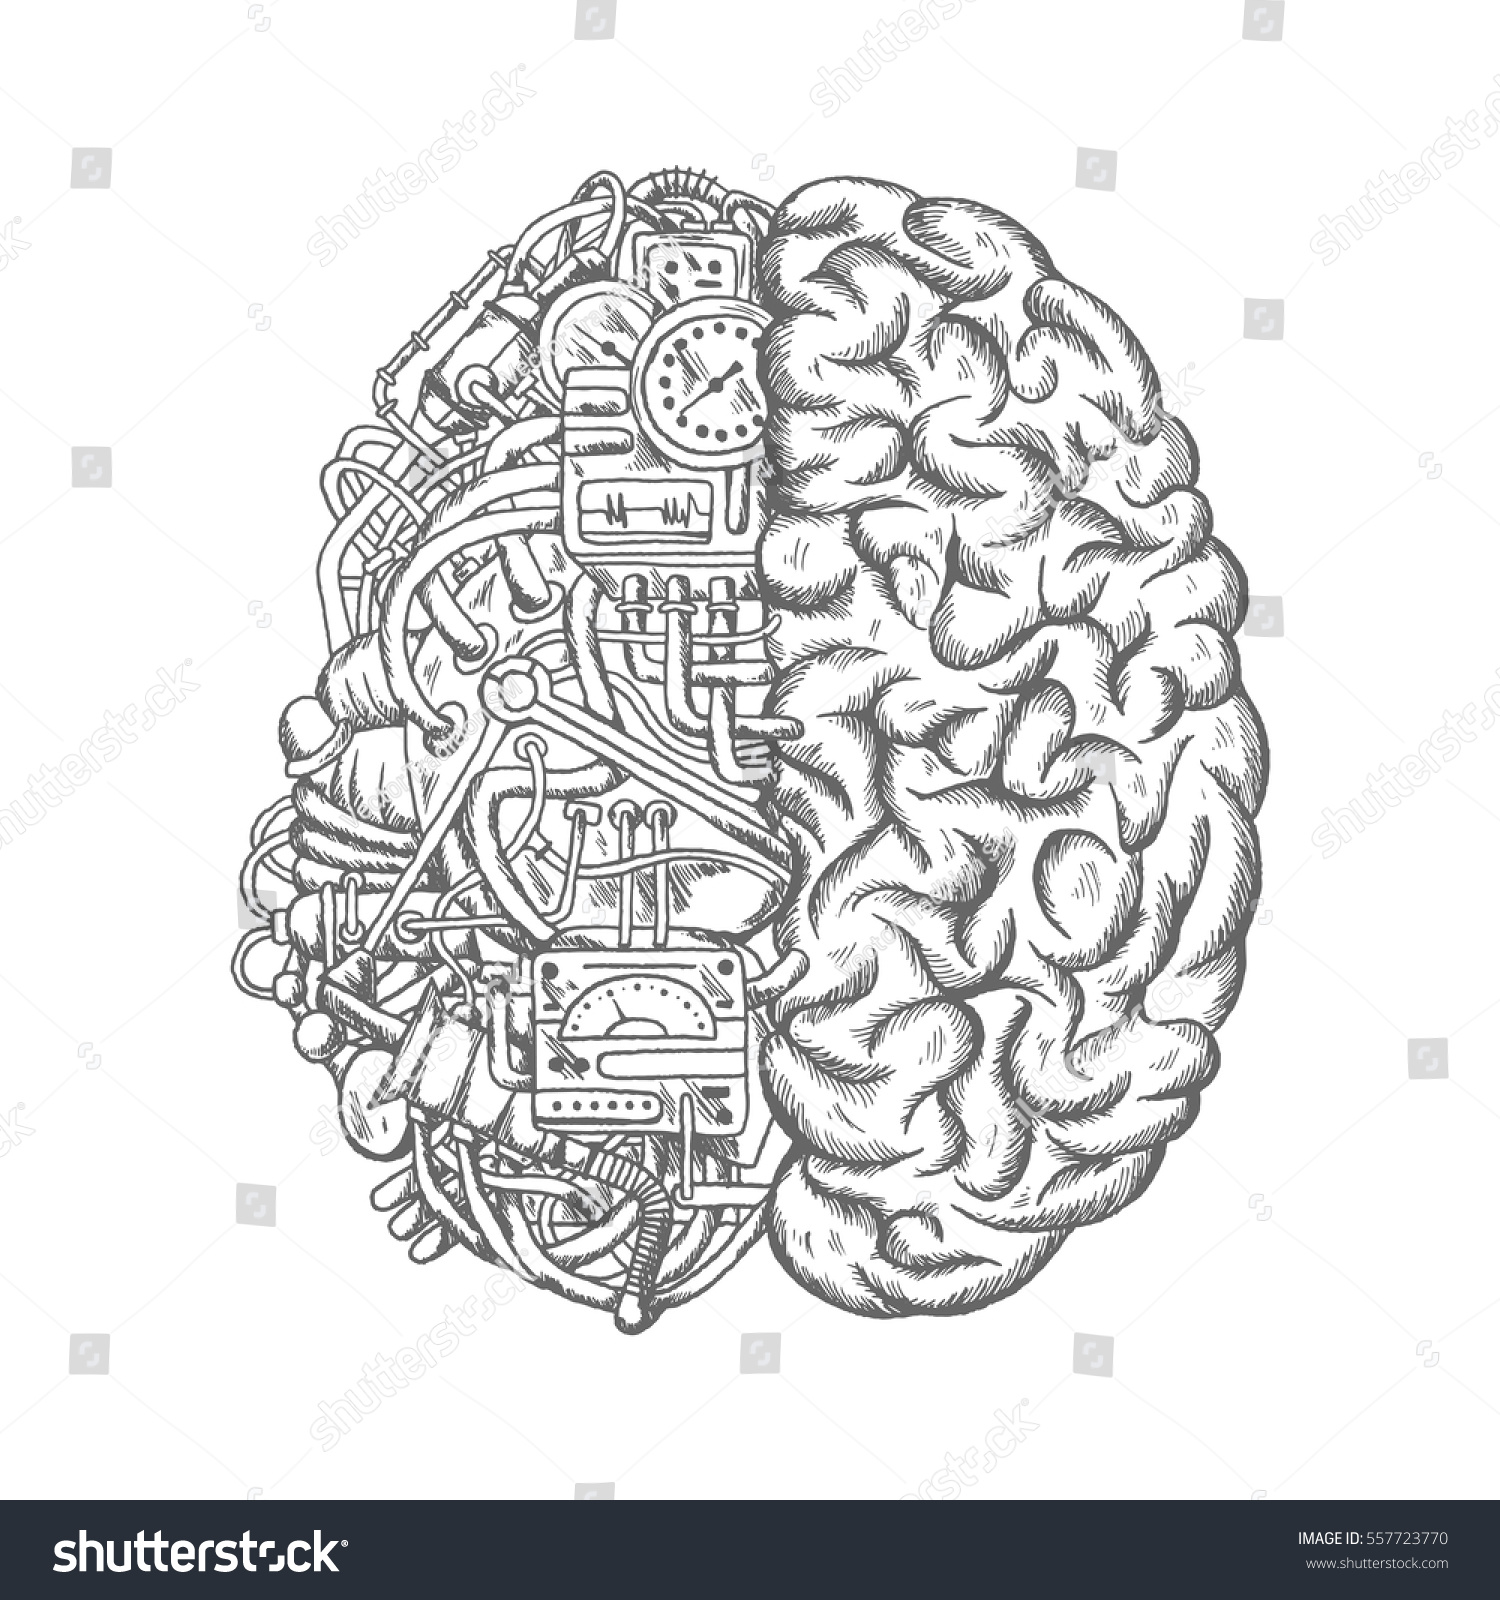 Brain Cyborg Sketch Human Brain Half Stock Vector Royalty Free